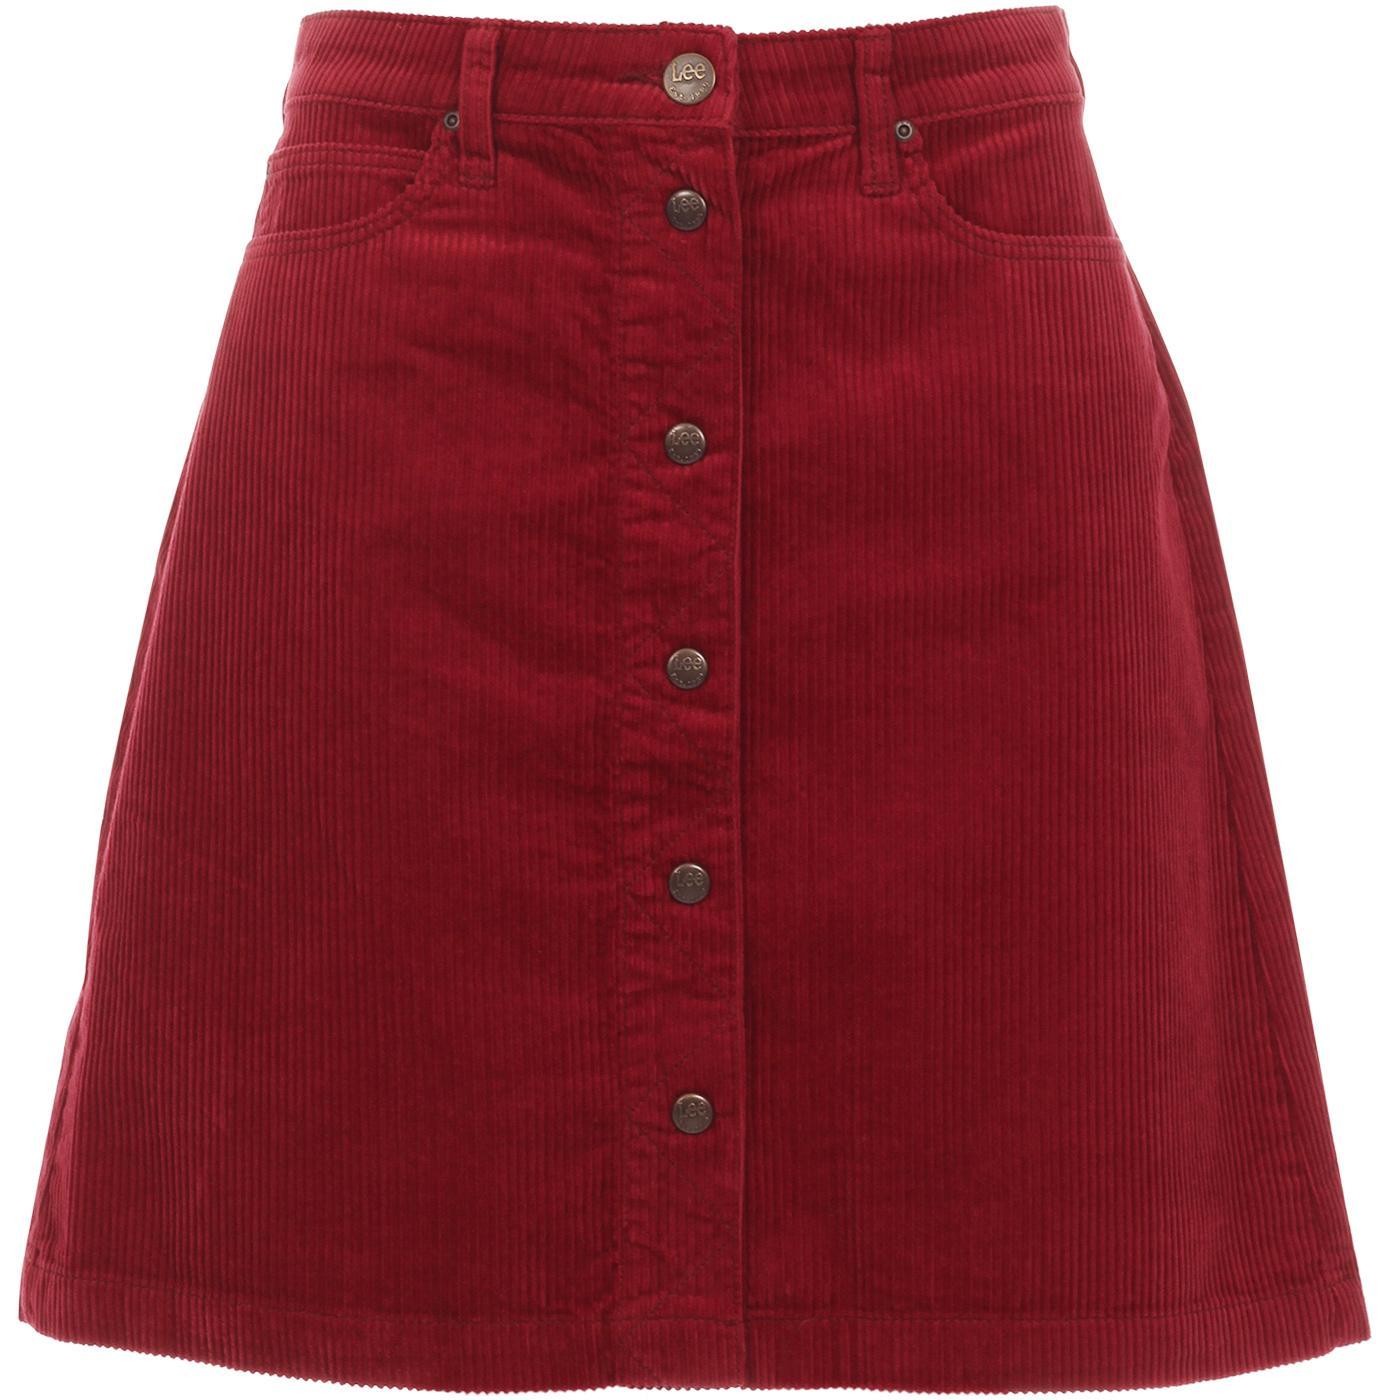 LEE JEANS Womens Retro Cord A-Line Mini Skirt (BR)